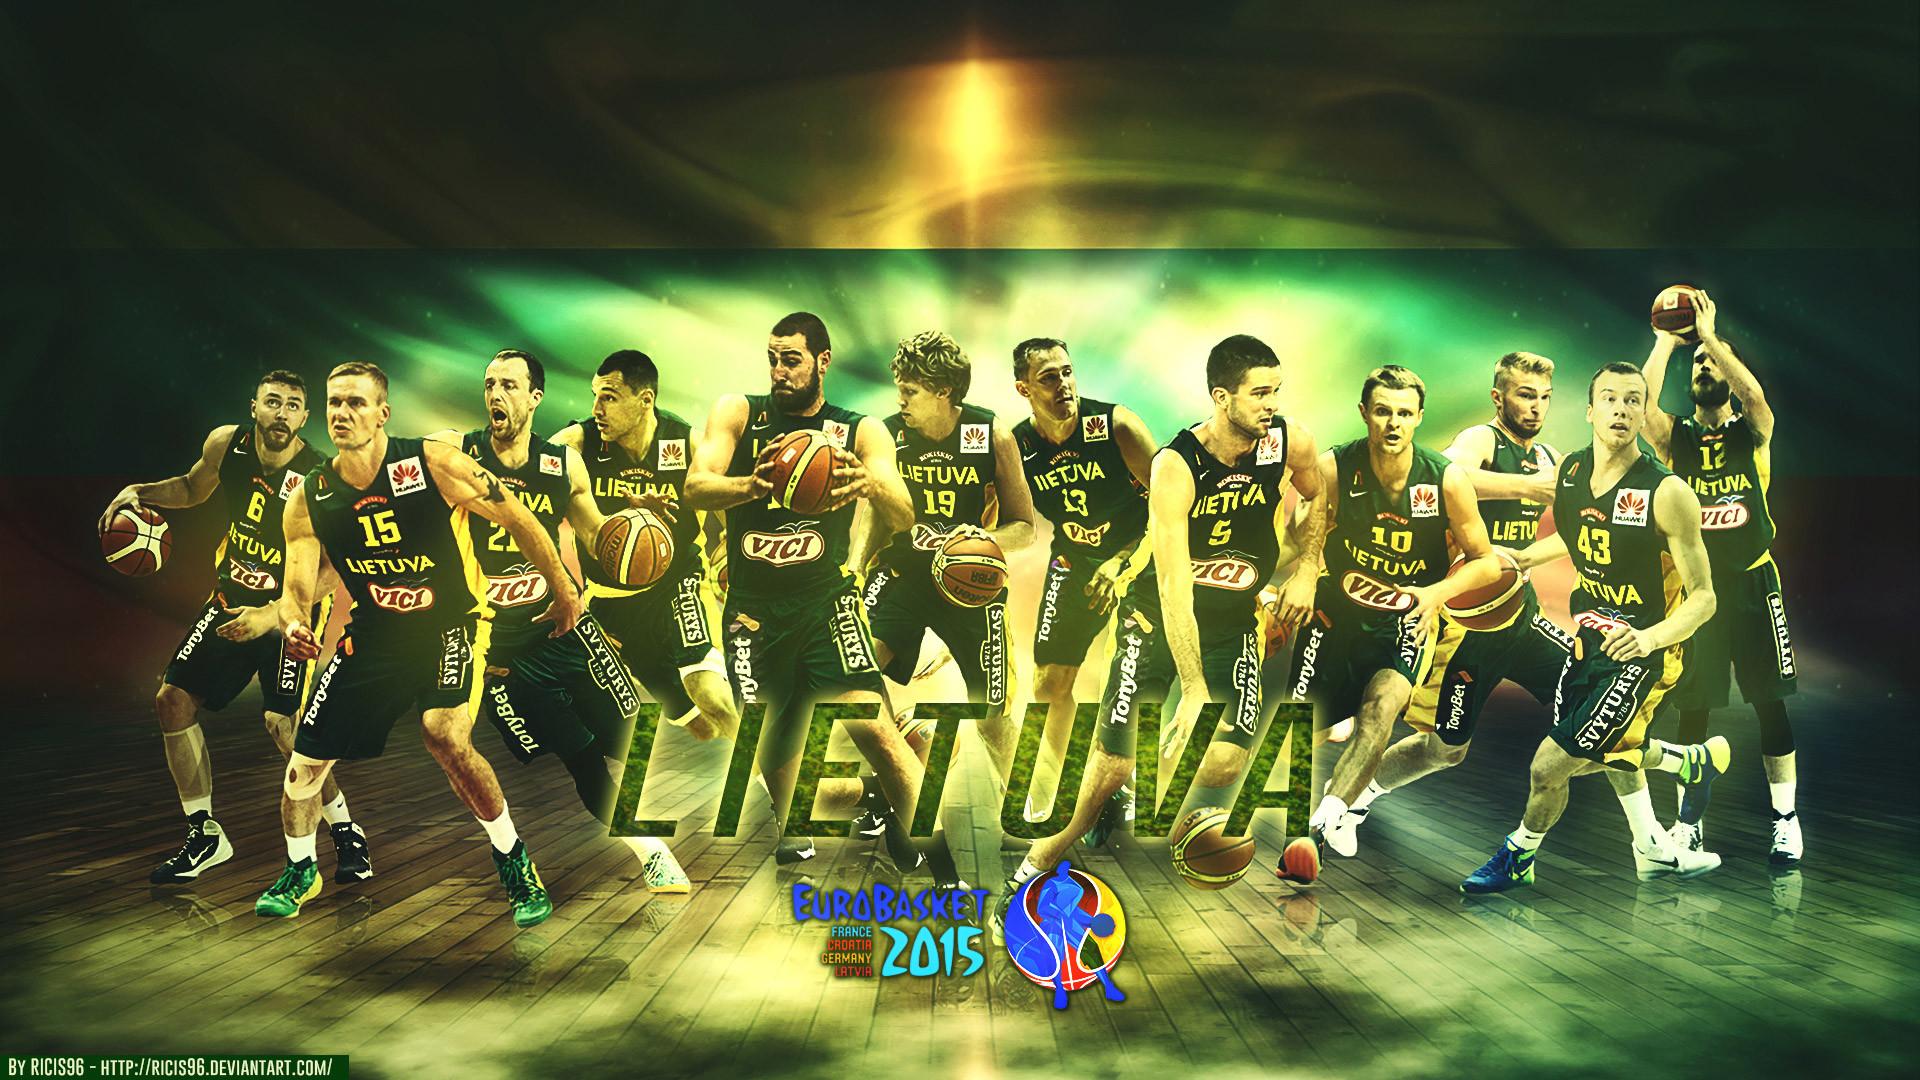 Res: 1920x1080, Lithuania Team Eurobasket 2015 1920×1080 Wallpaper